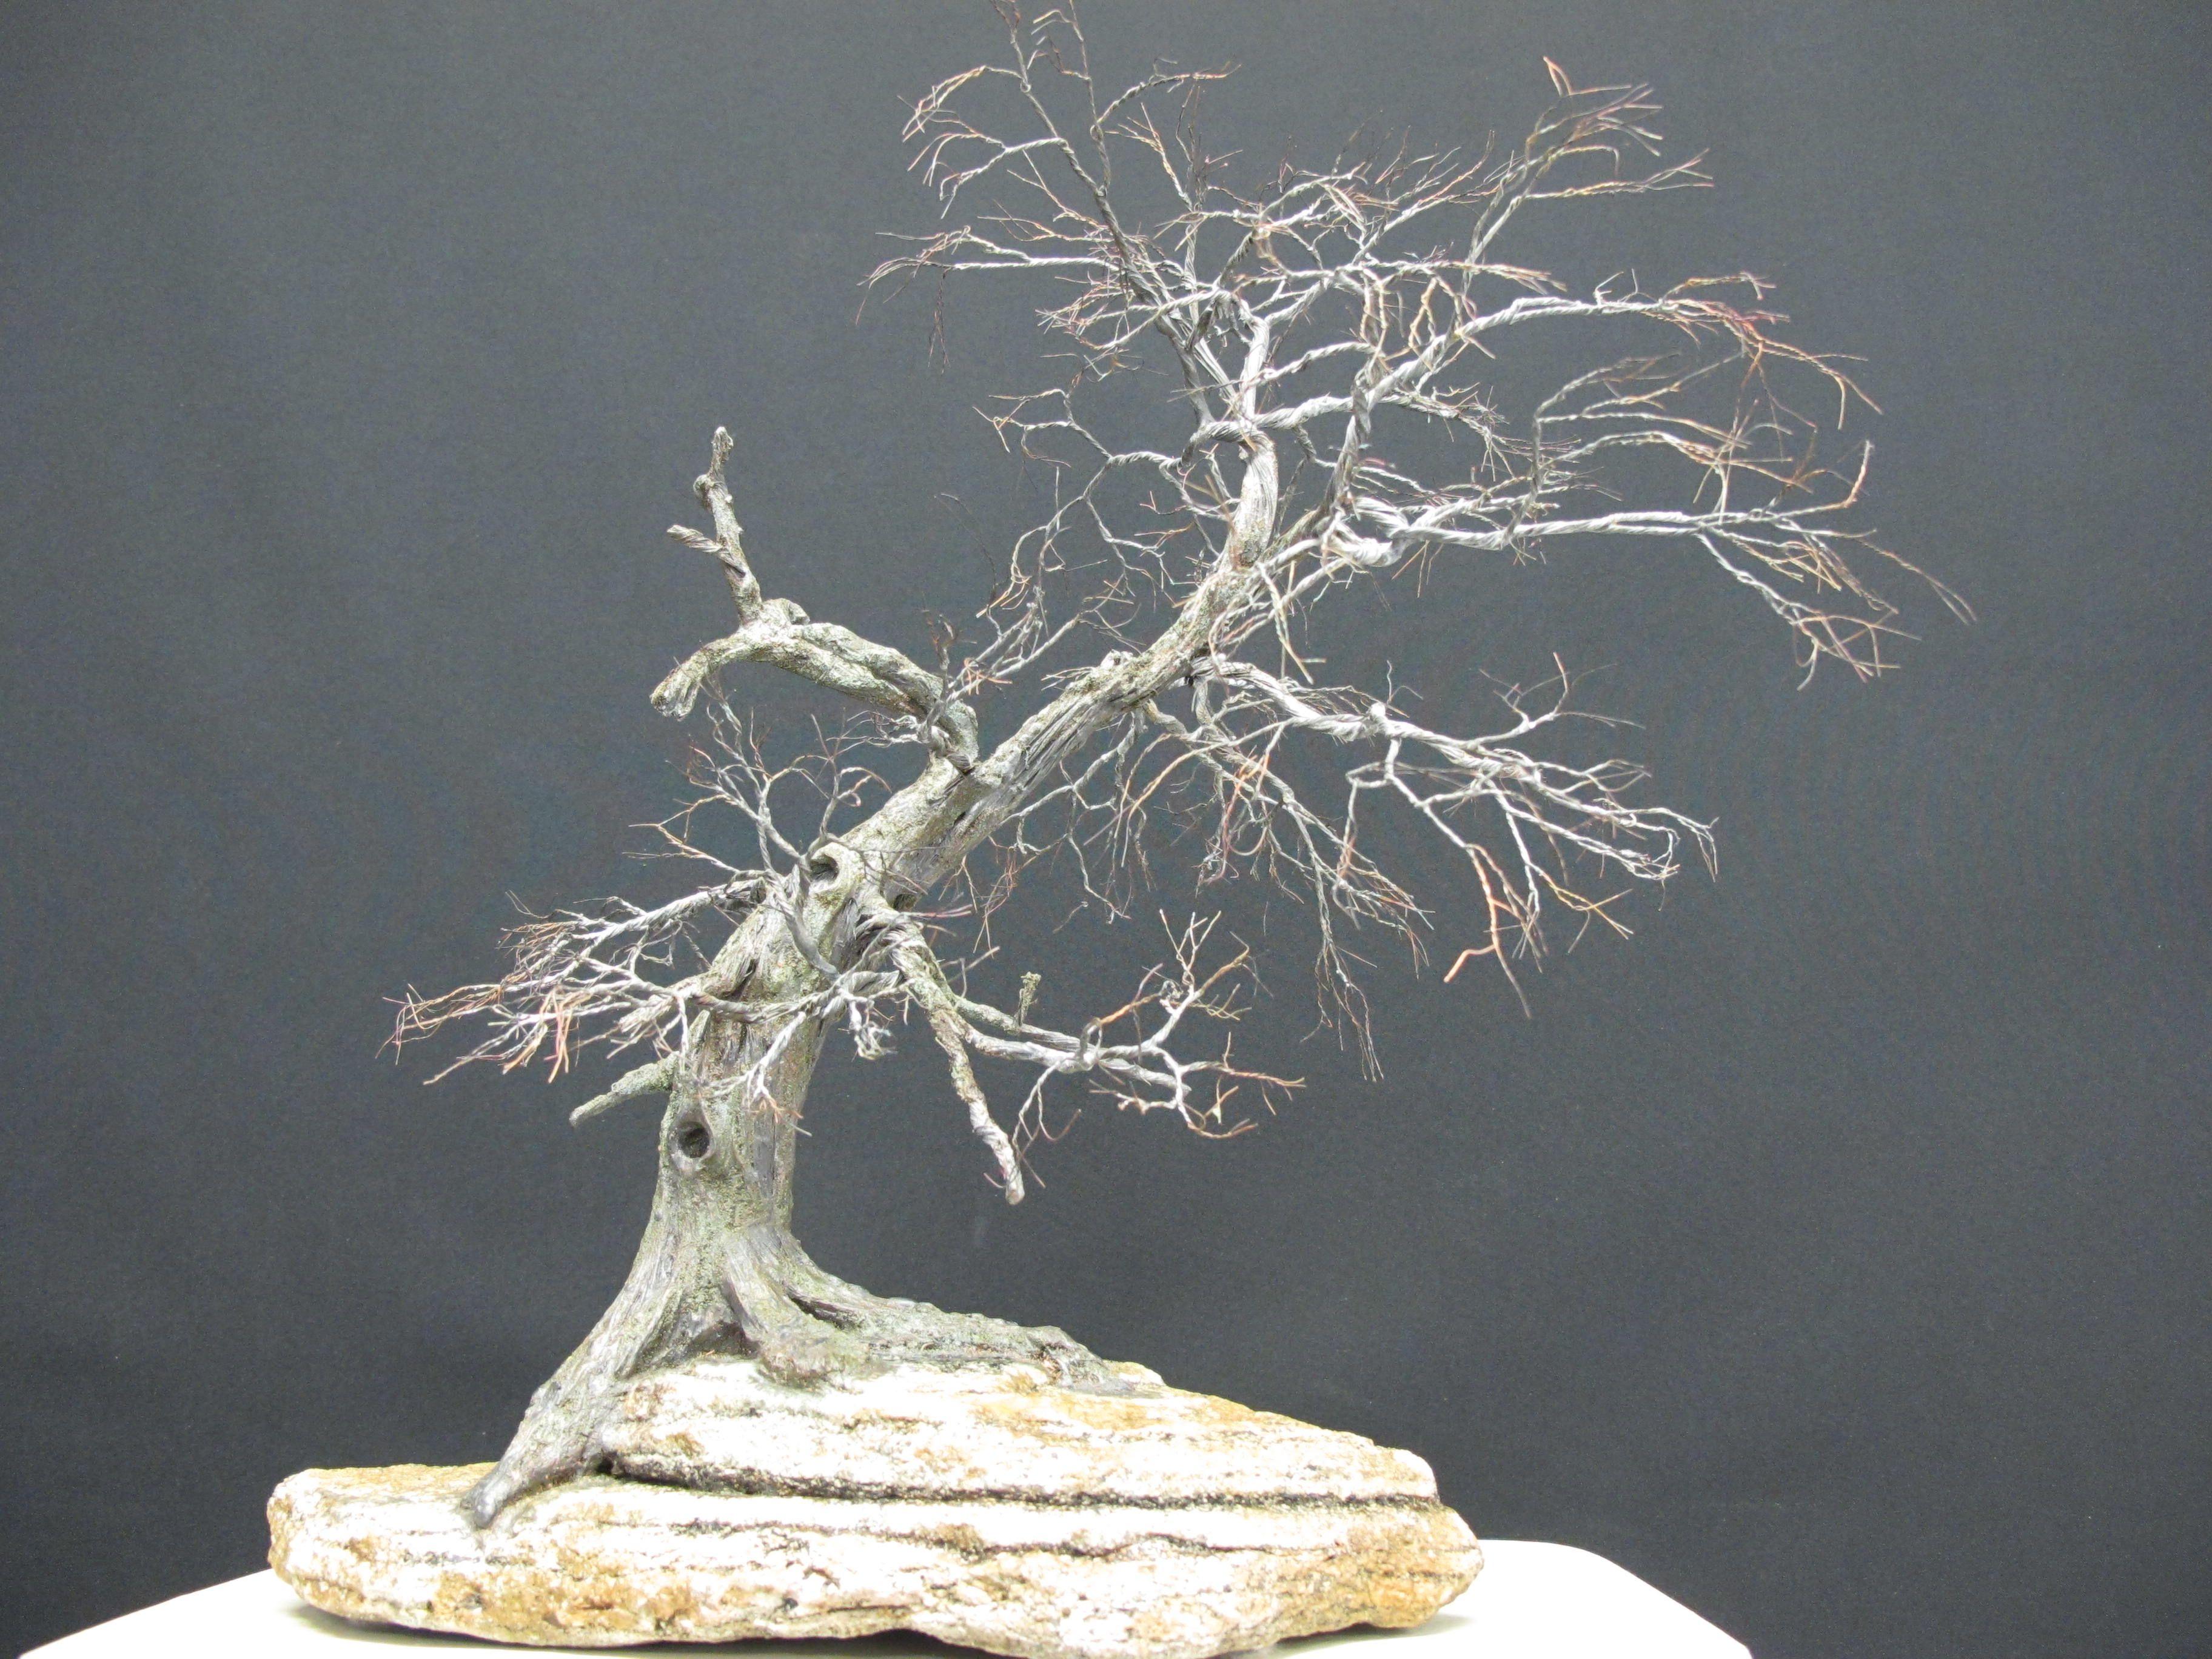 Copper wire tree - Bonsai or Penjing style - Recycled material - Natural rock - Wabi Sabi - Shakan - Slanting